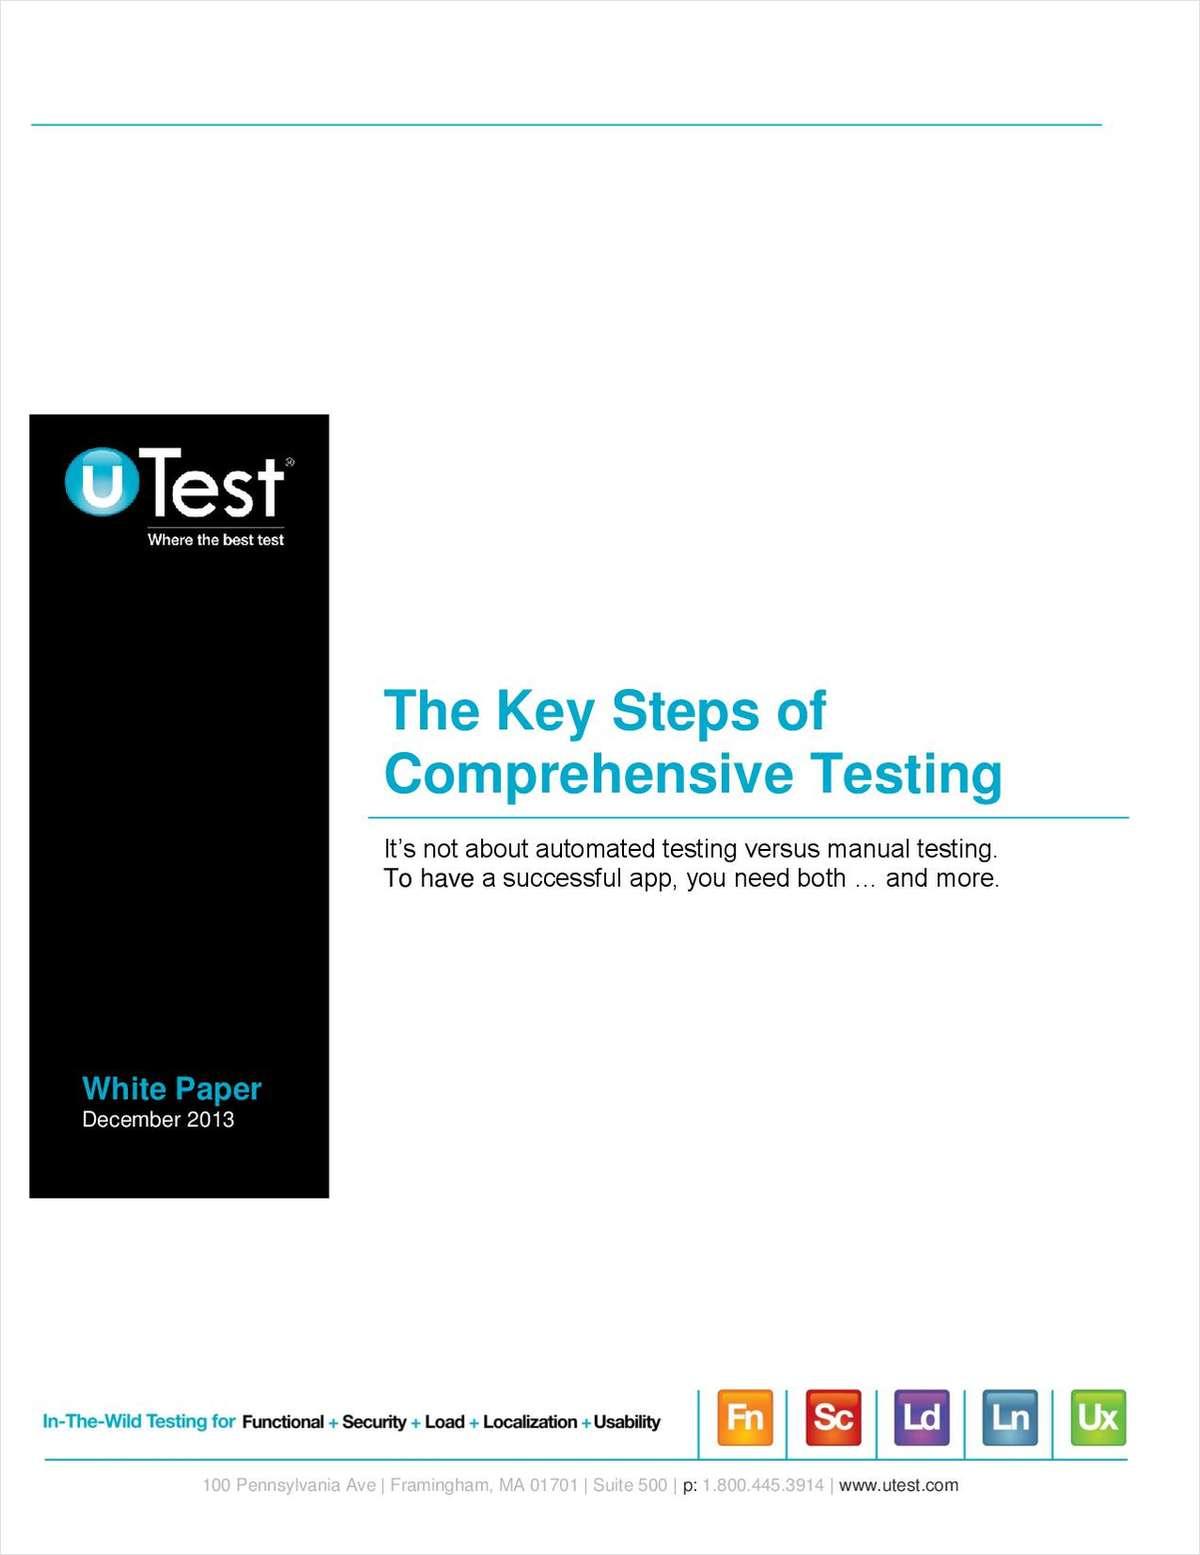 The Key Steps of Comprehensive Testing